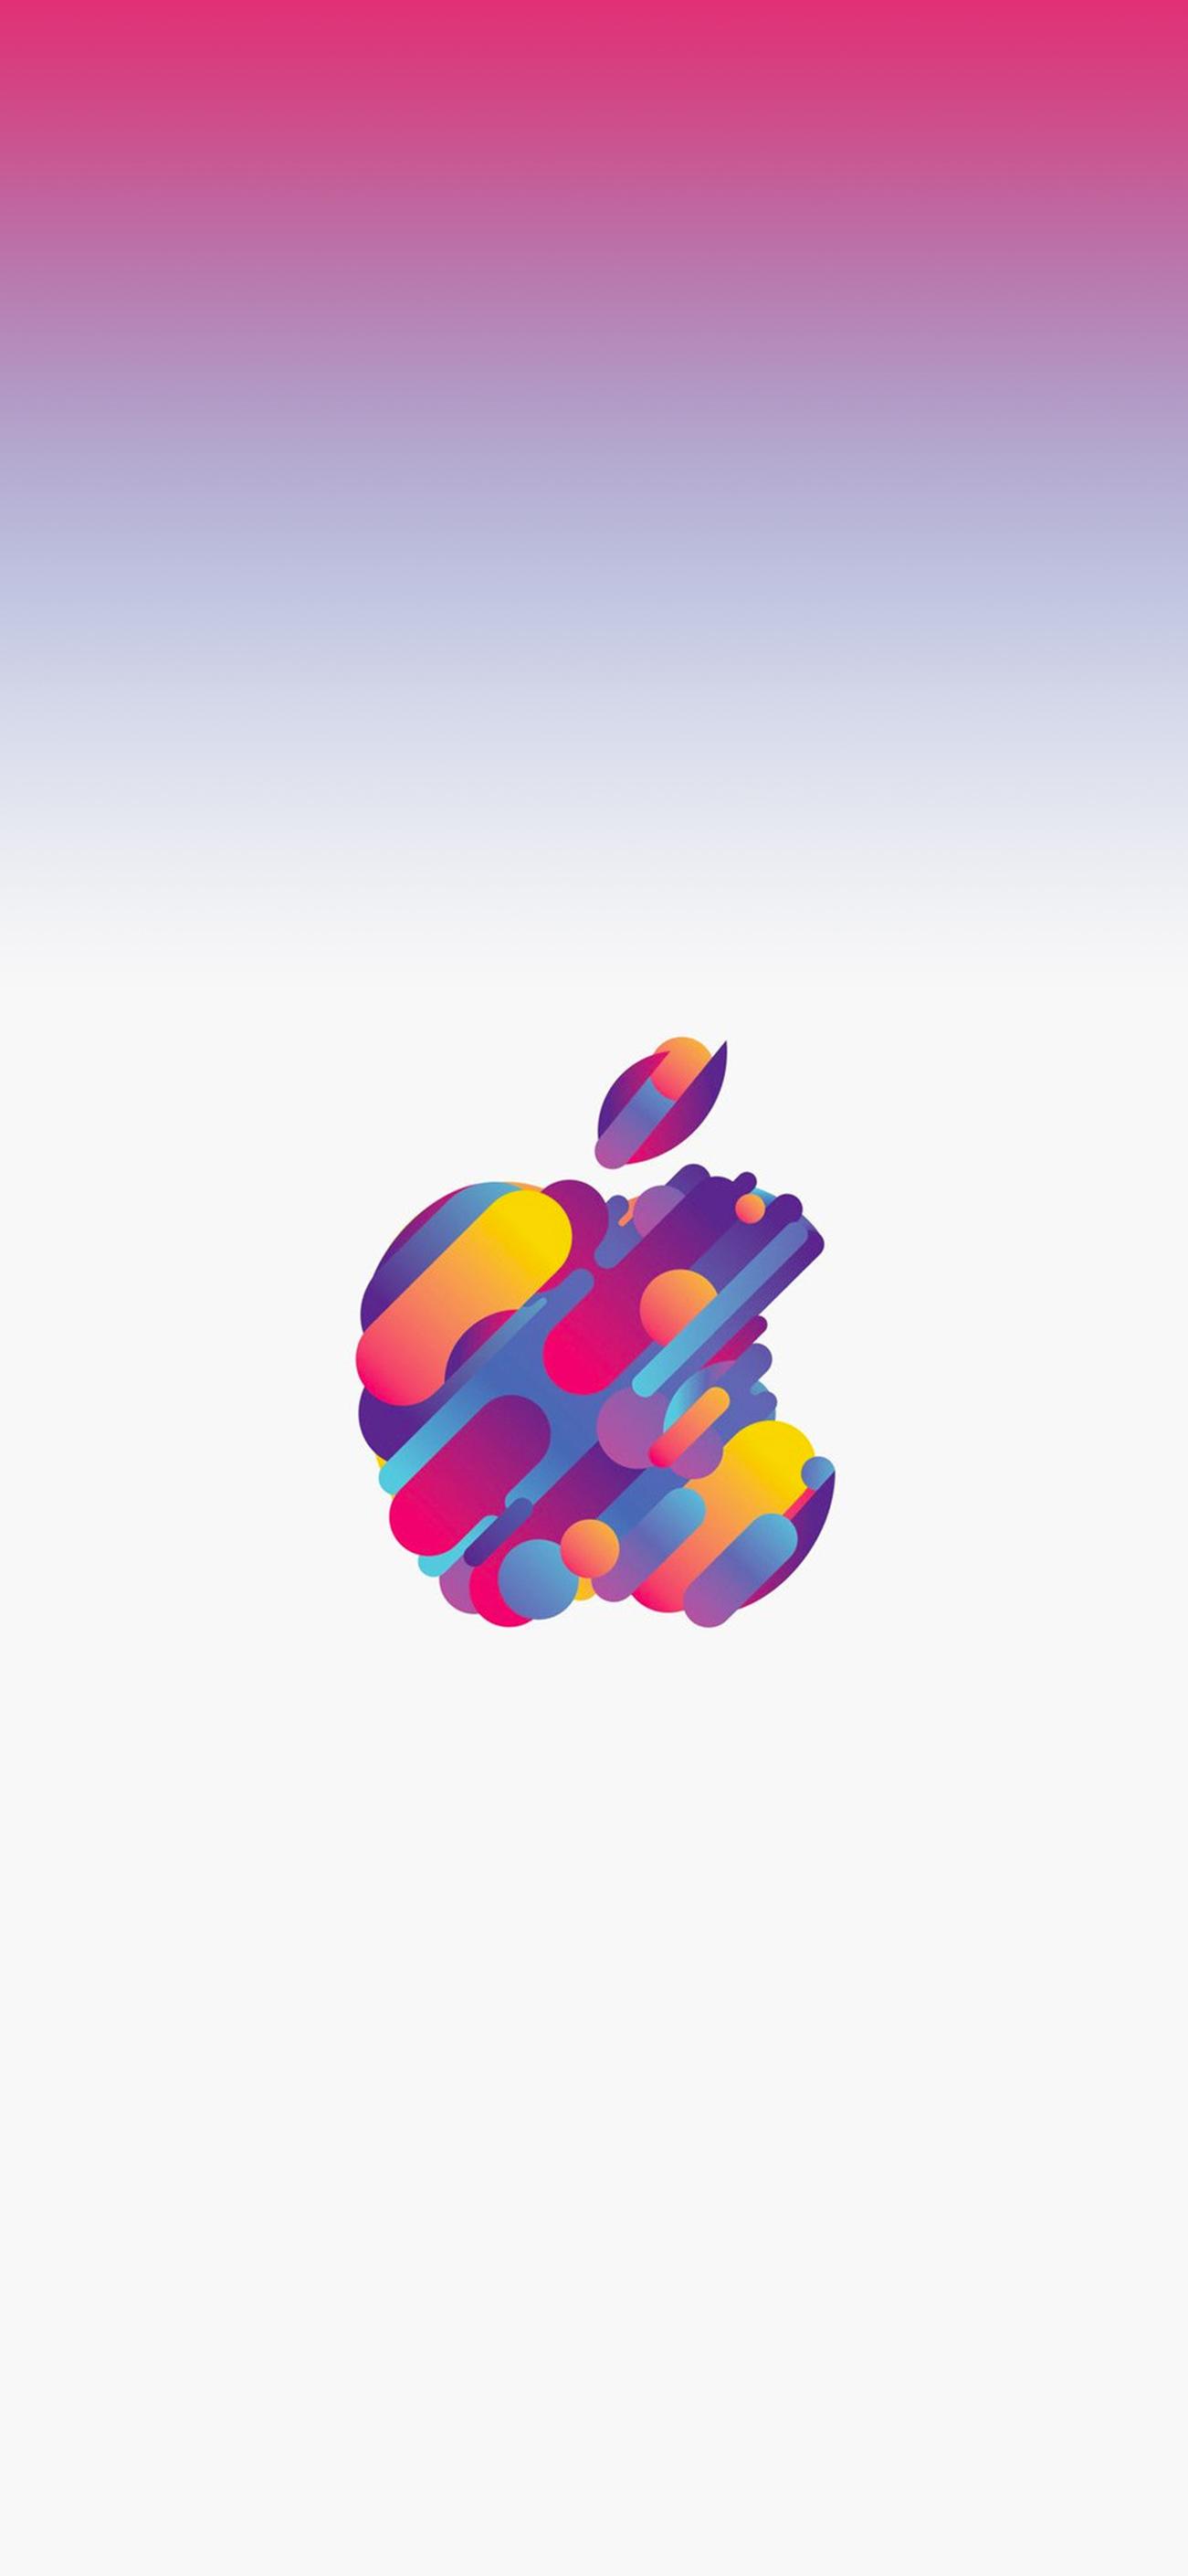 Apple Logo 30 October Event Official Wallpaper 27 Live Wallpaper Wallpapers Central